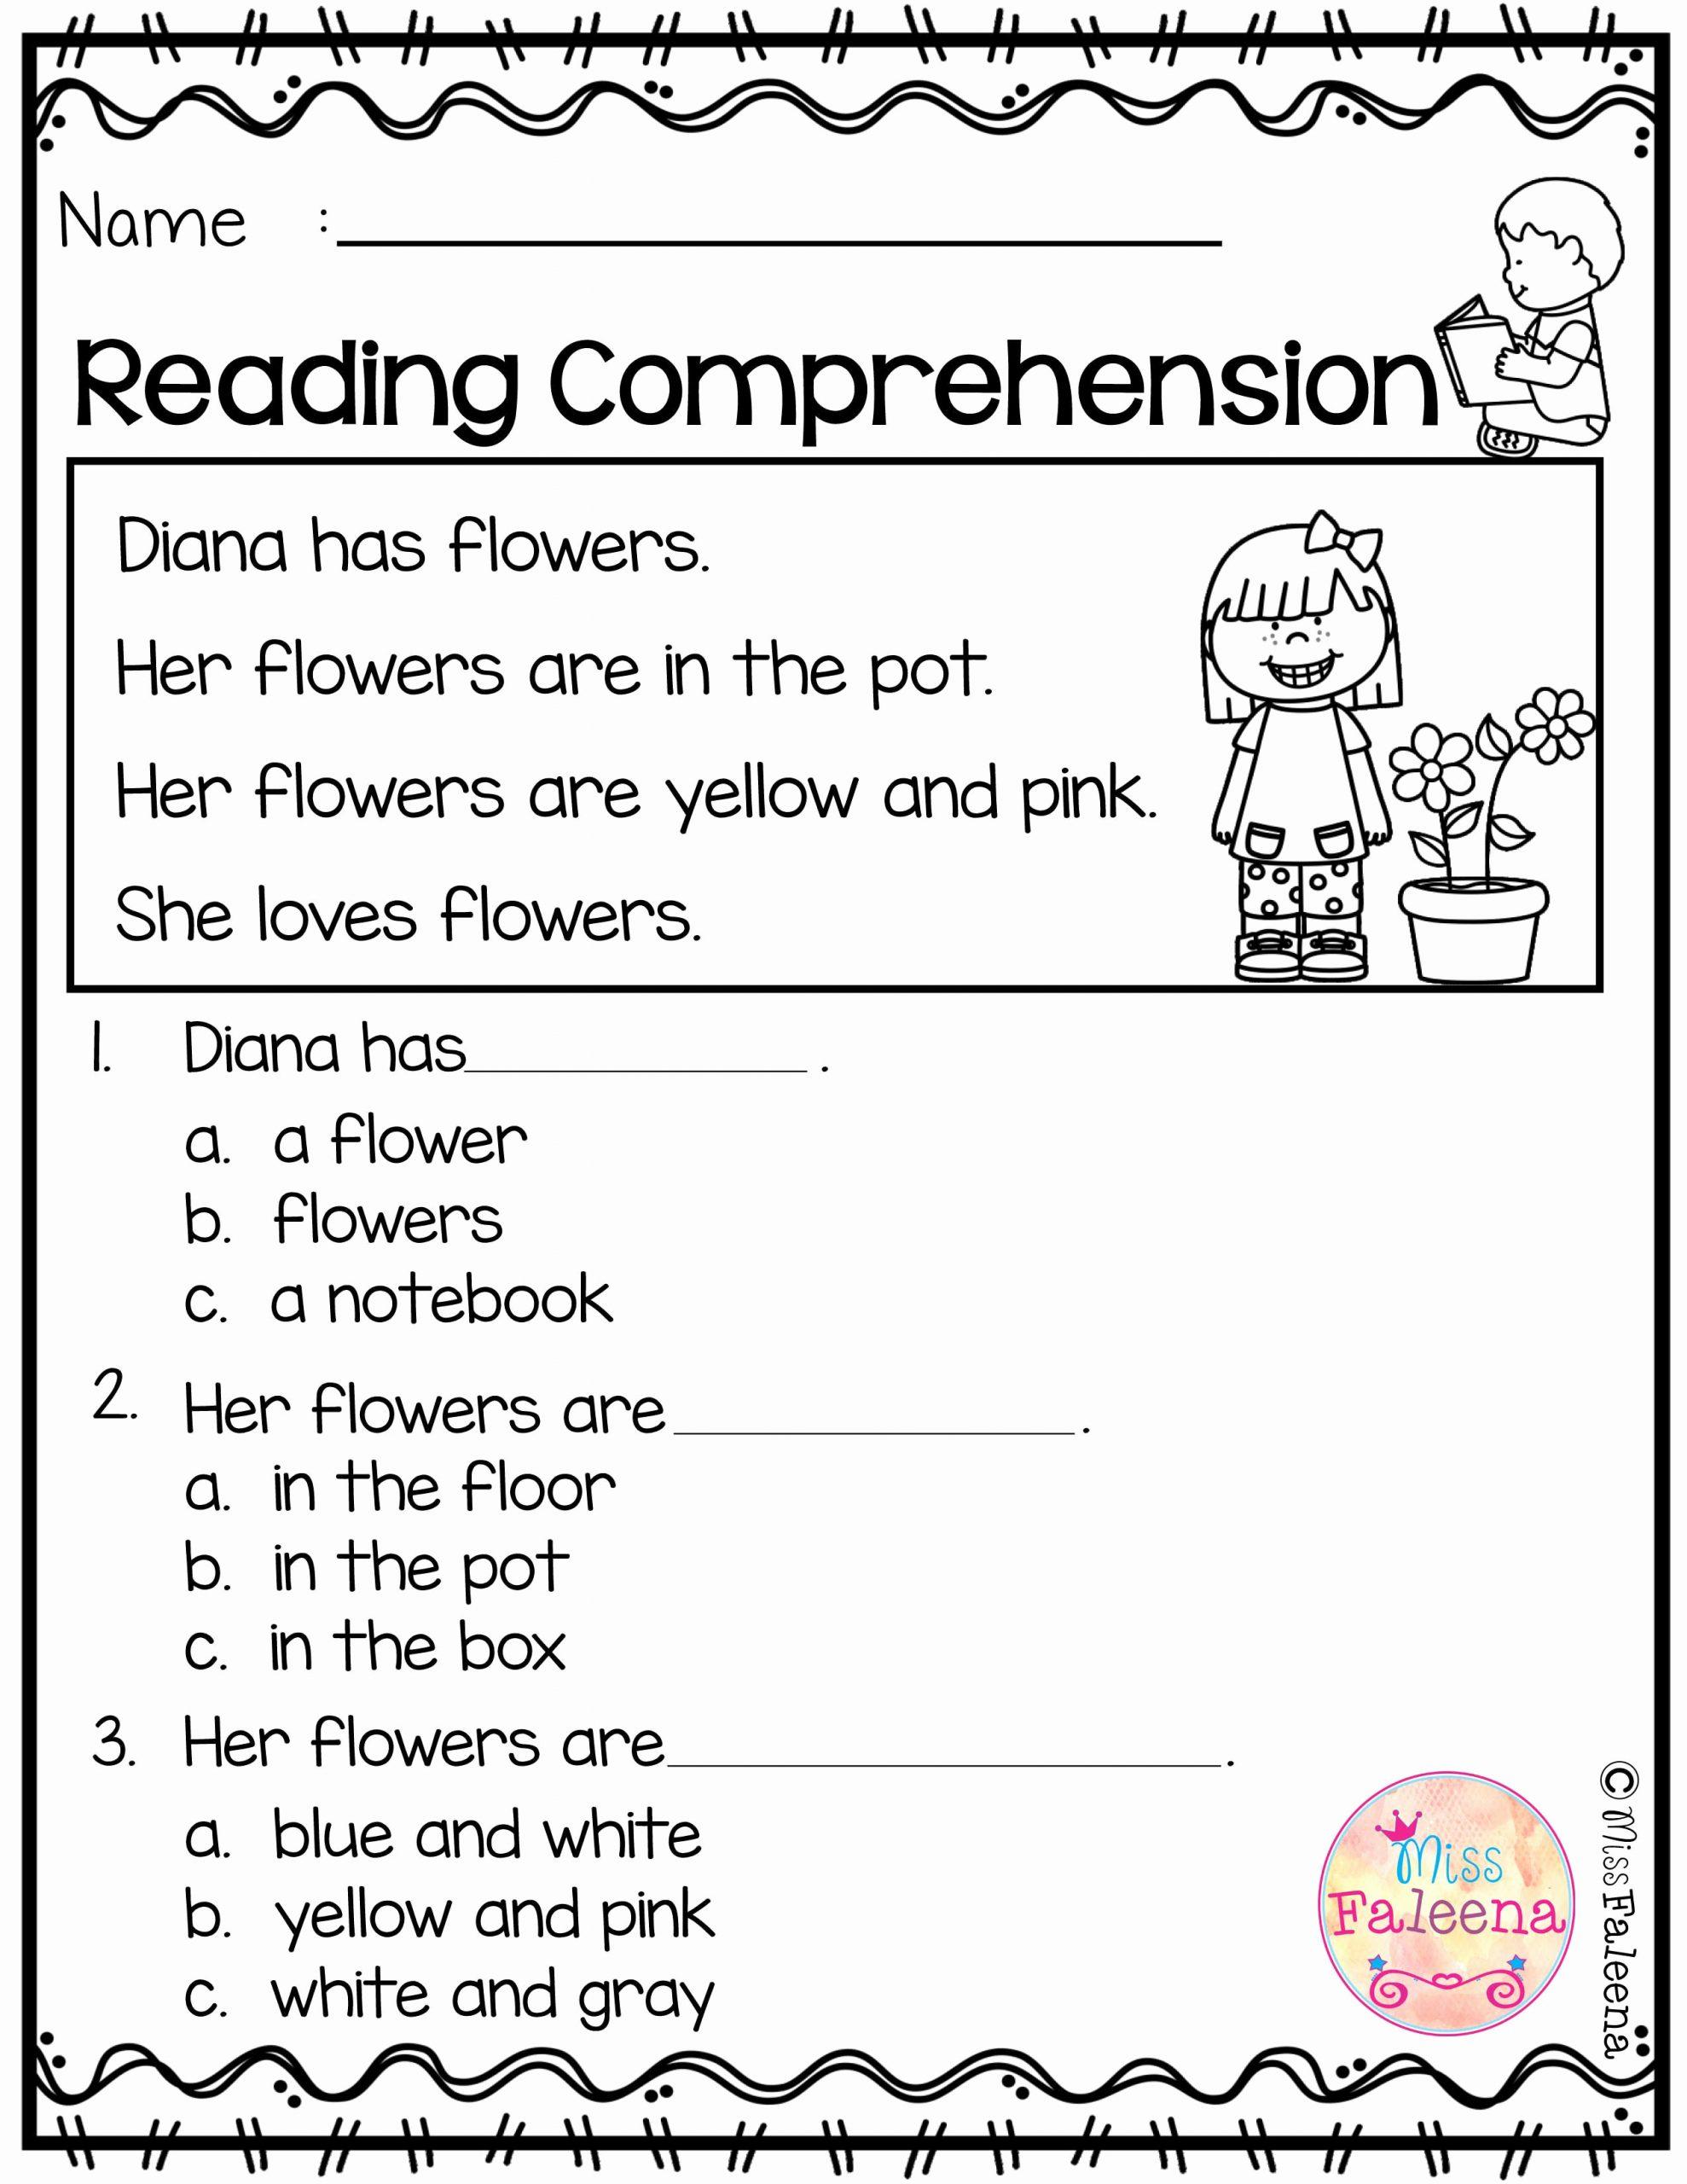 Preschool Reading Comprehension Worksheets Lovely Kindergarten Worksheets Reading Prehension